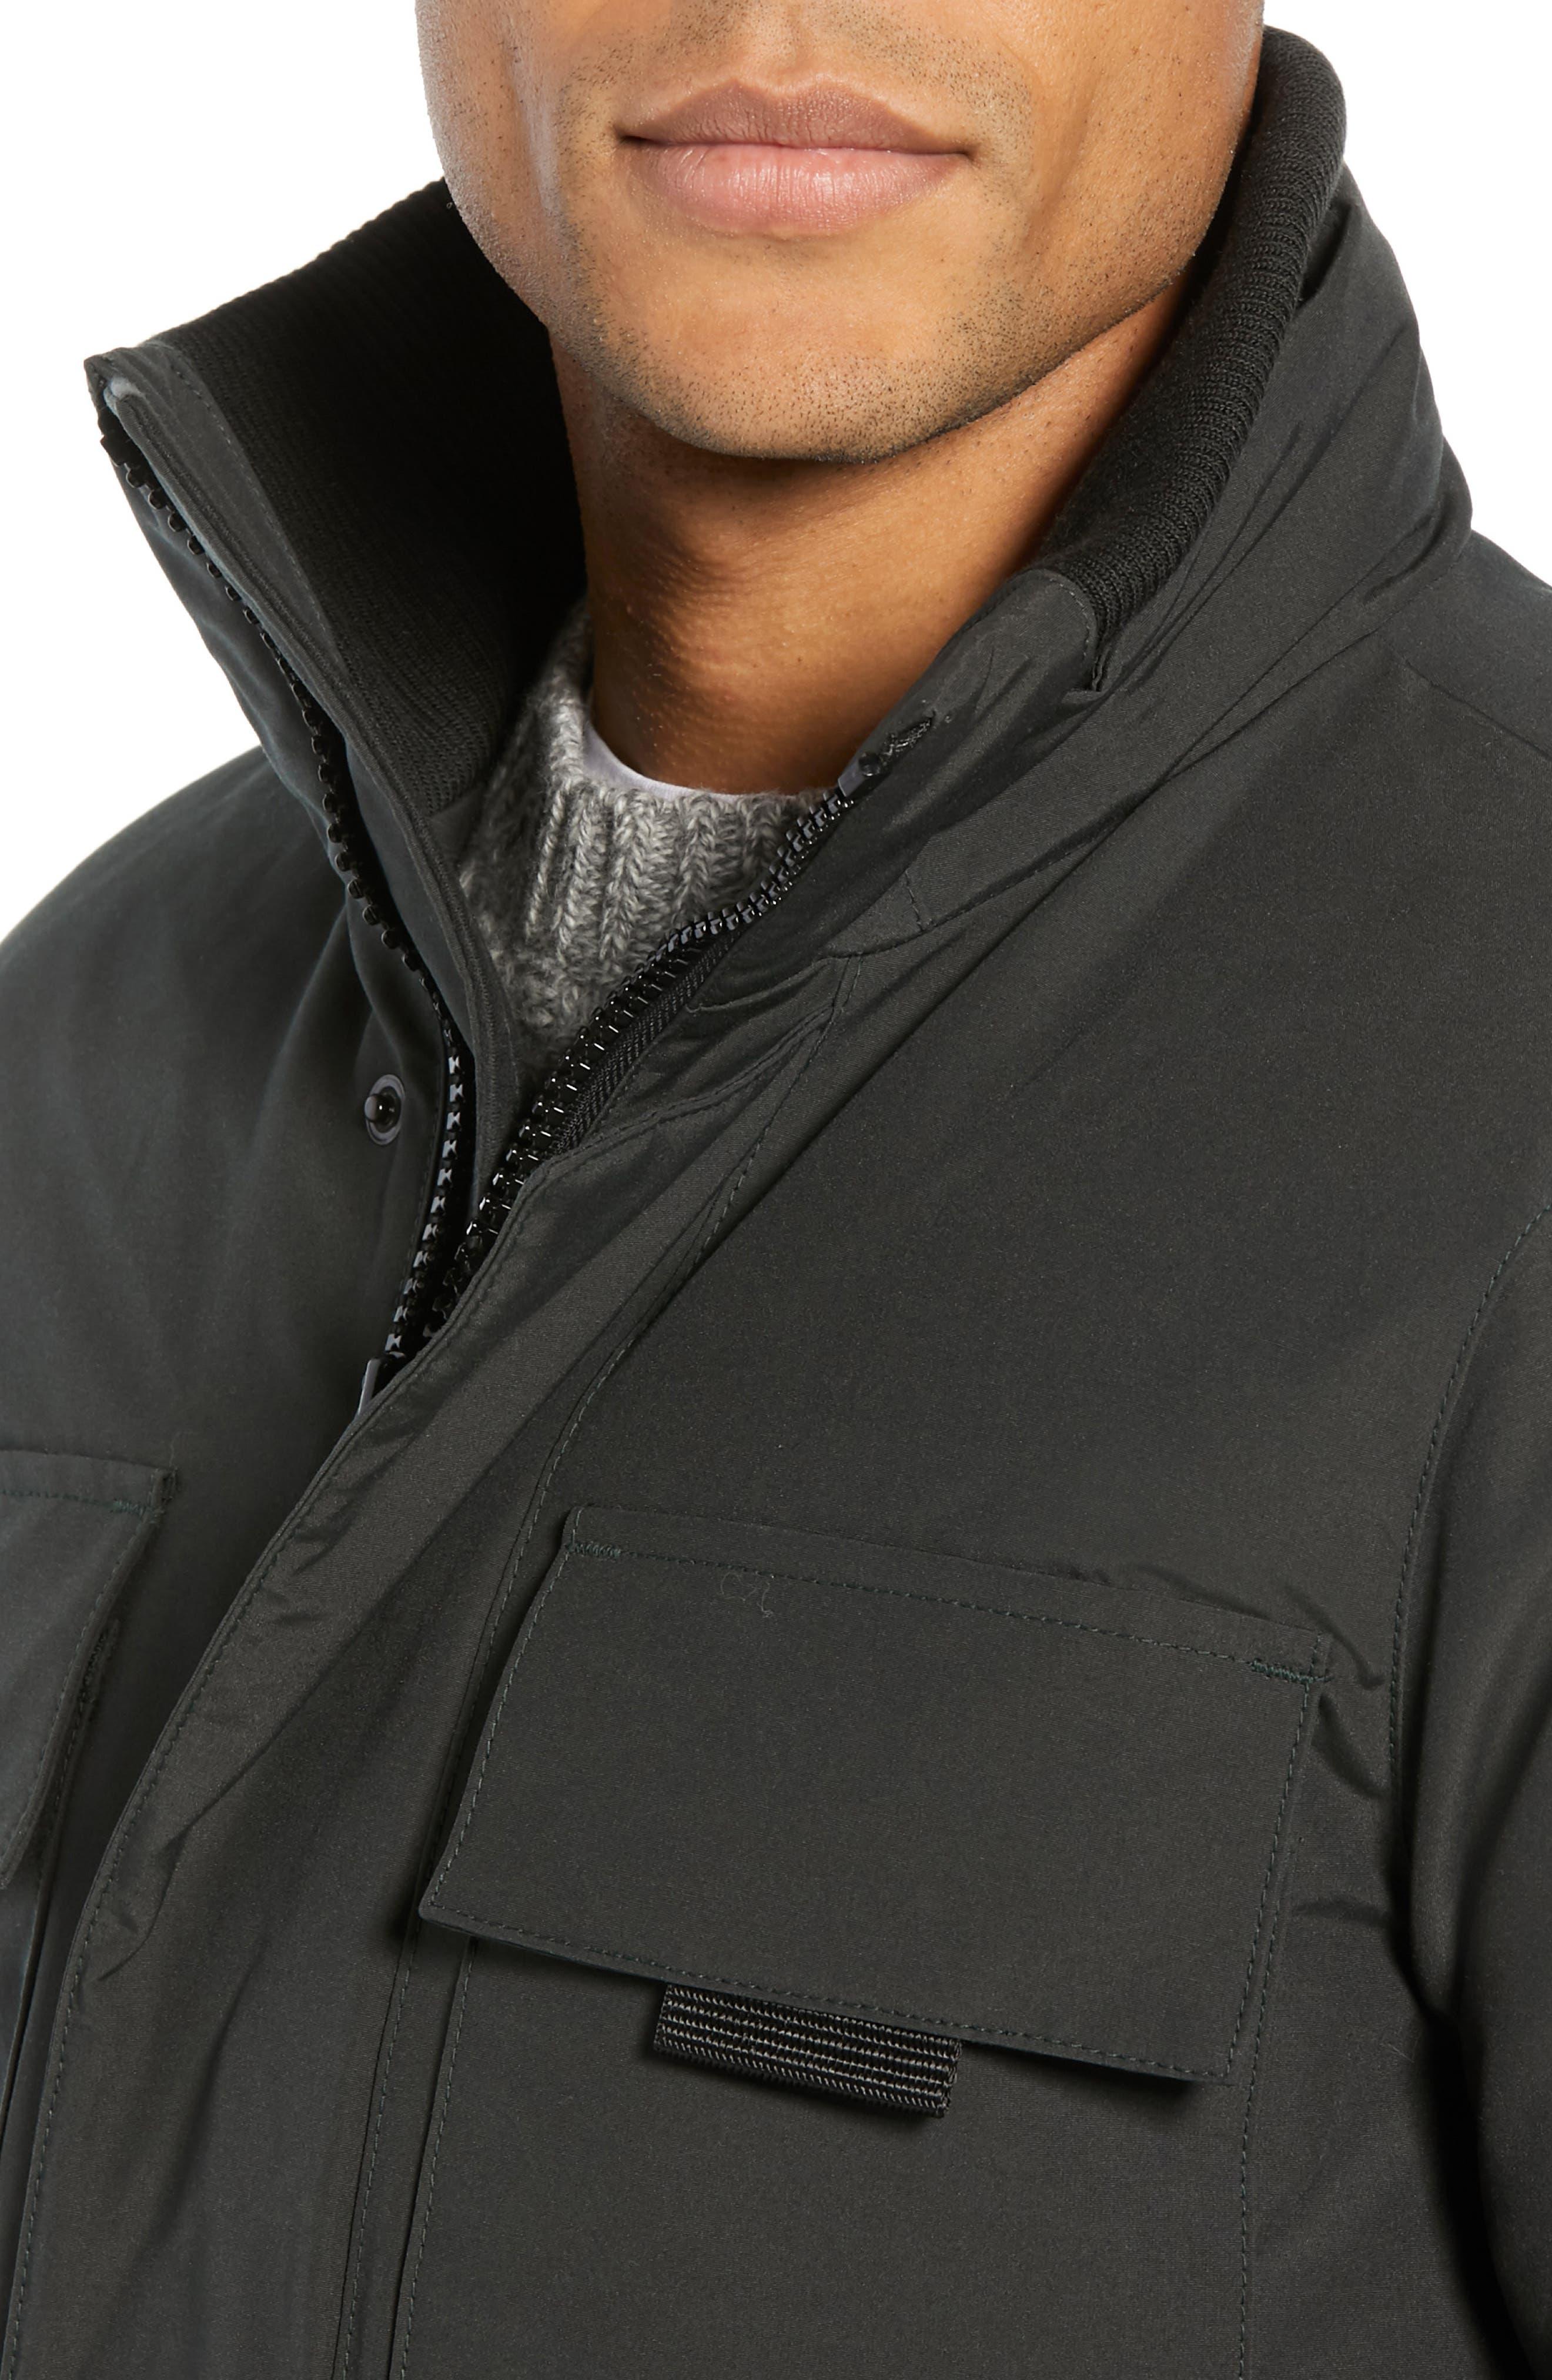 CANADA GOOSE,                             Forester Slim Fit Jacket,                             Alternate thumbnail 4, color,                             BLACK